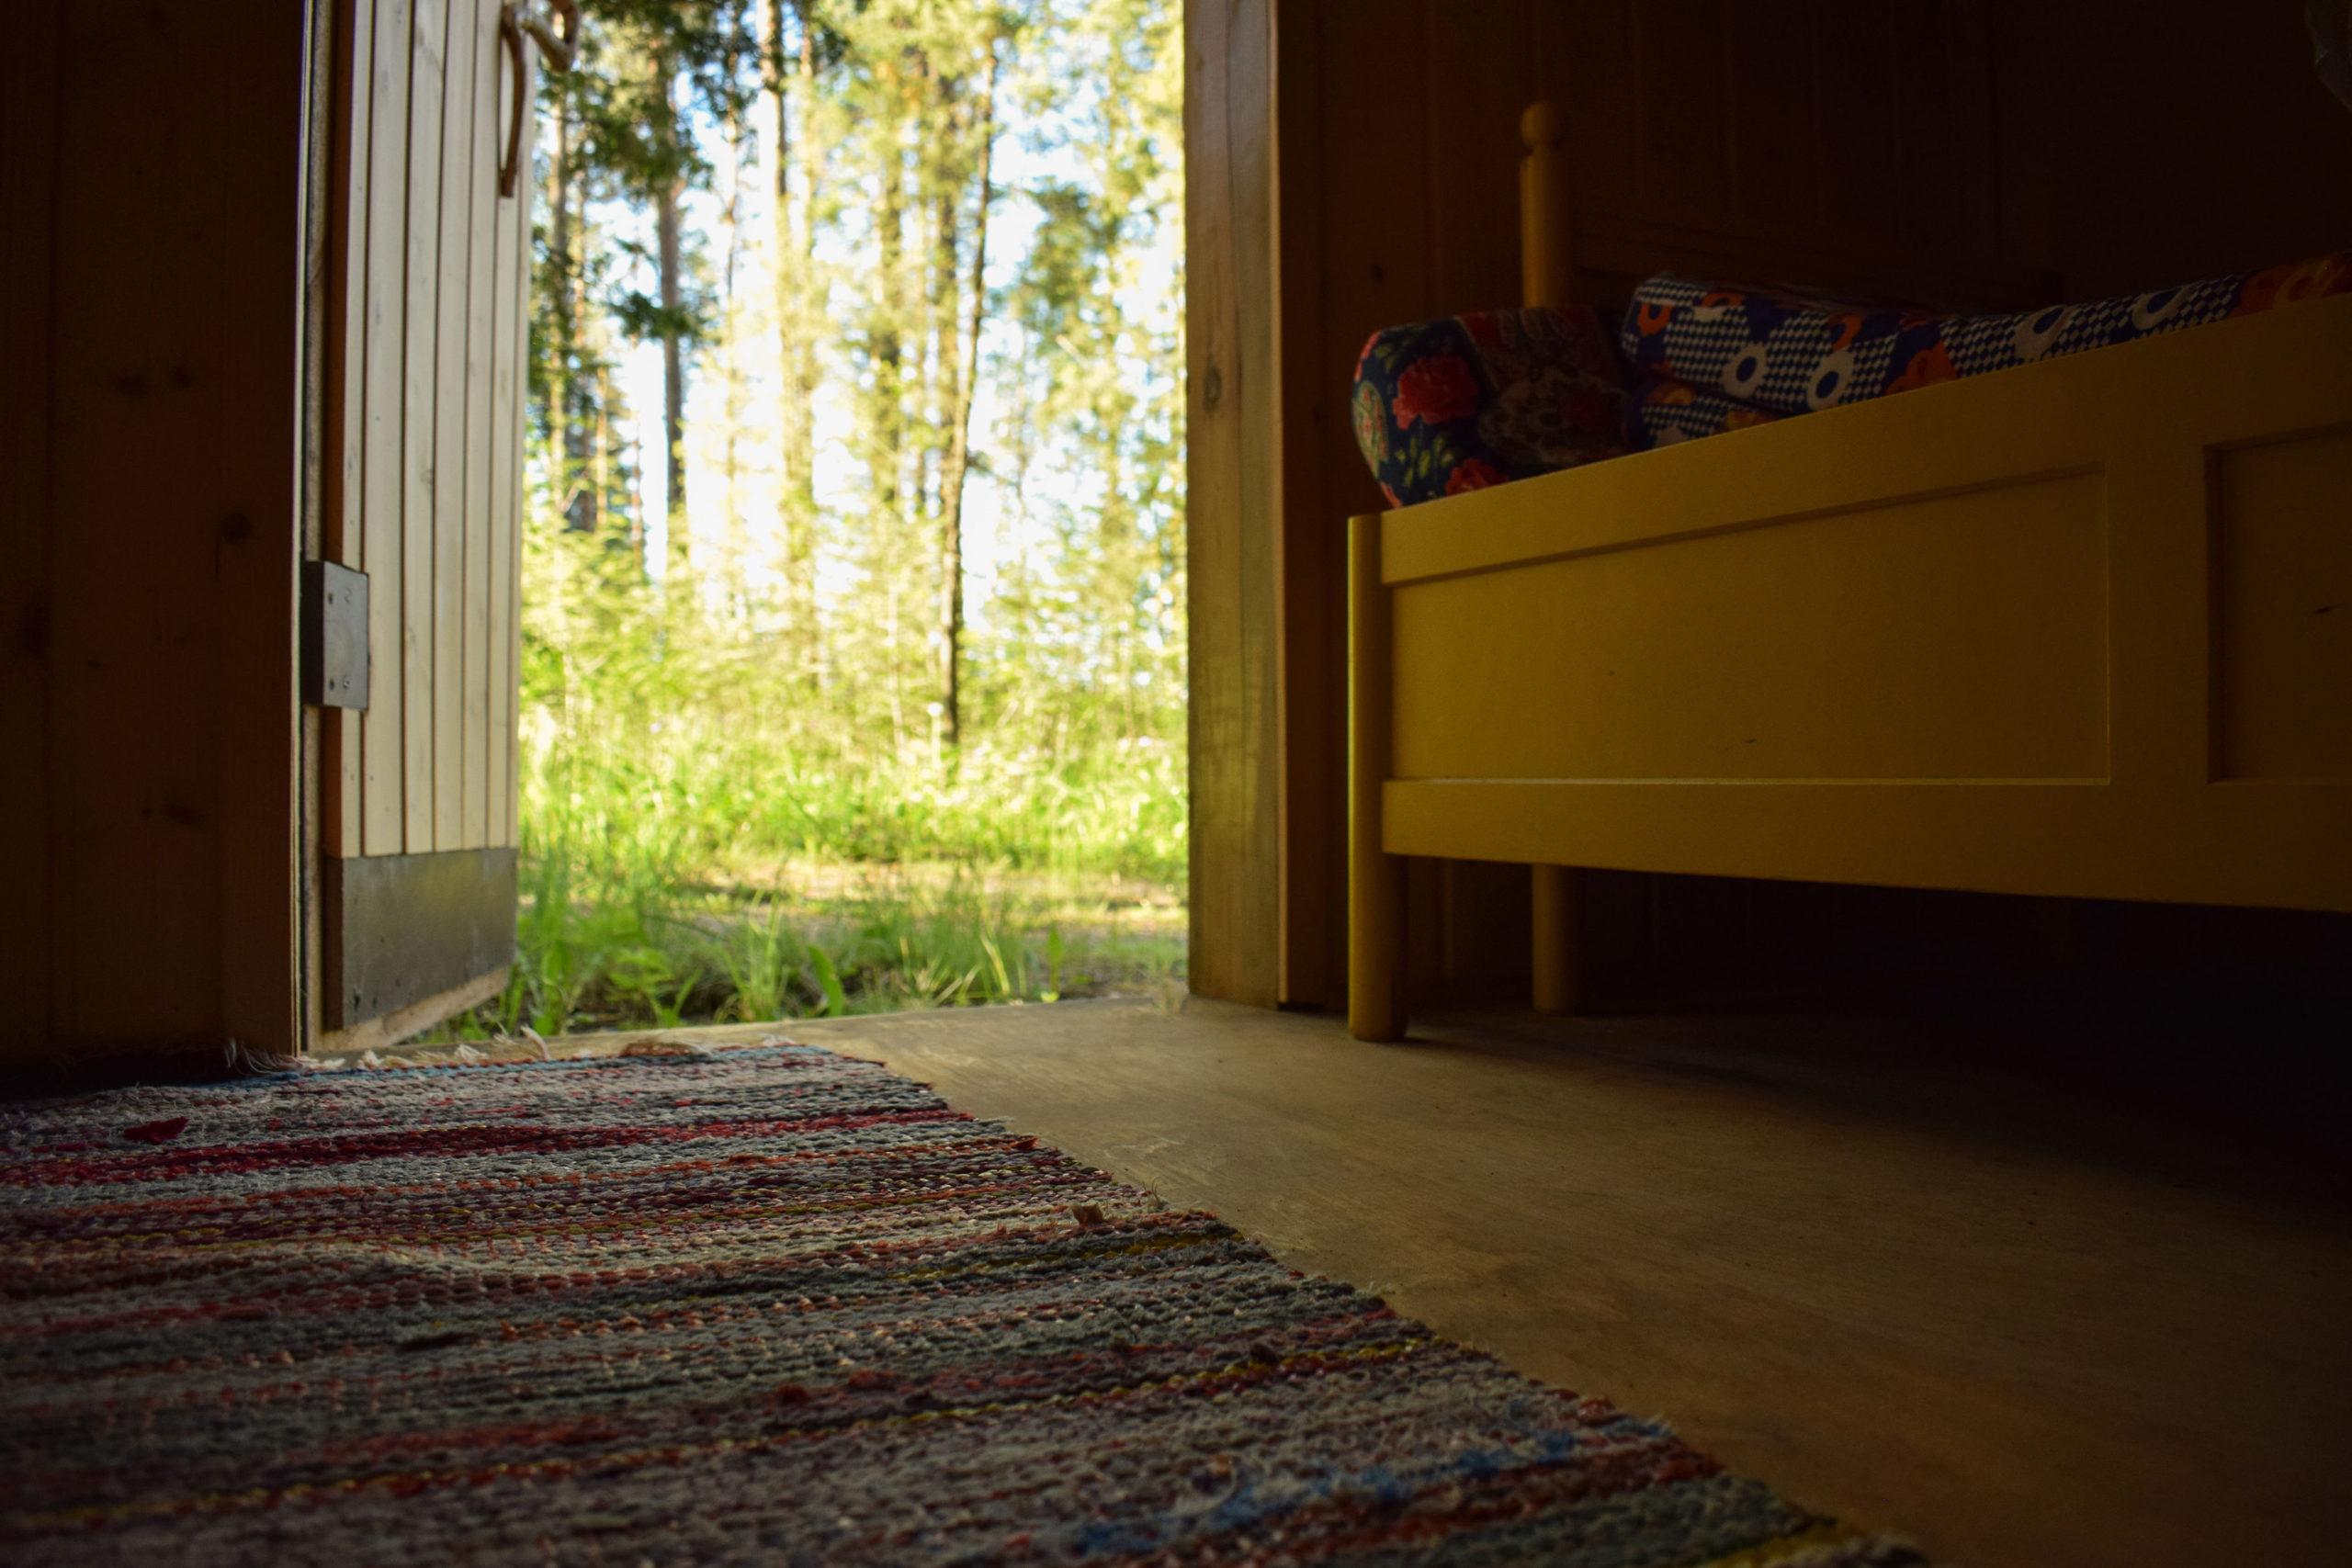 Traditional Finnish summer cottage atmosphere at Kukkoniemen Lomamökit rental cottages in Punkaharju, Saimaa